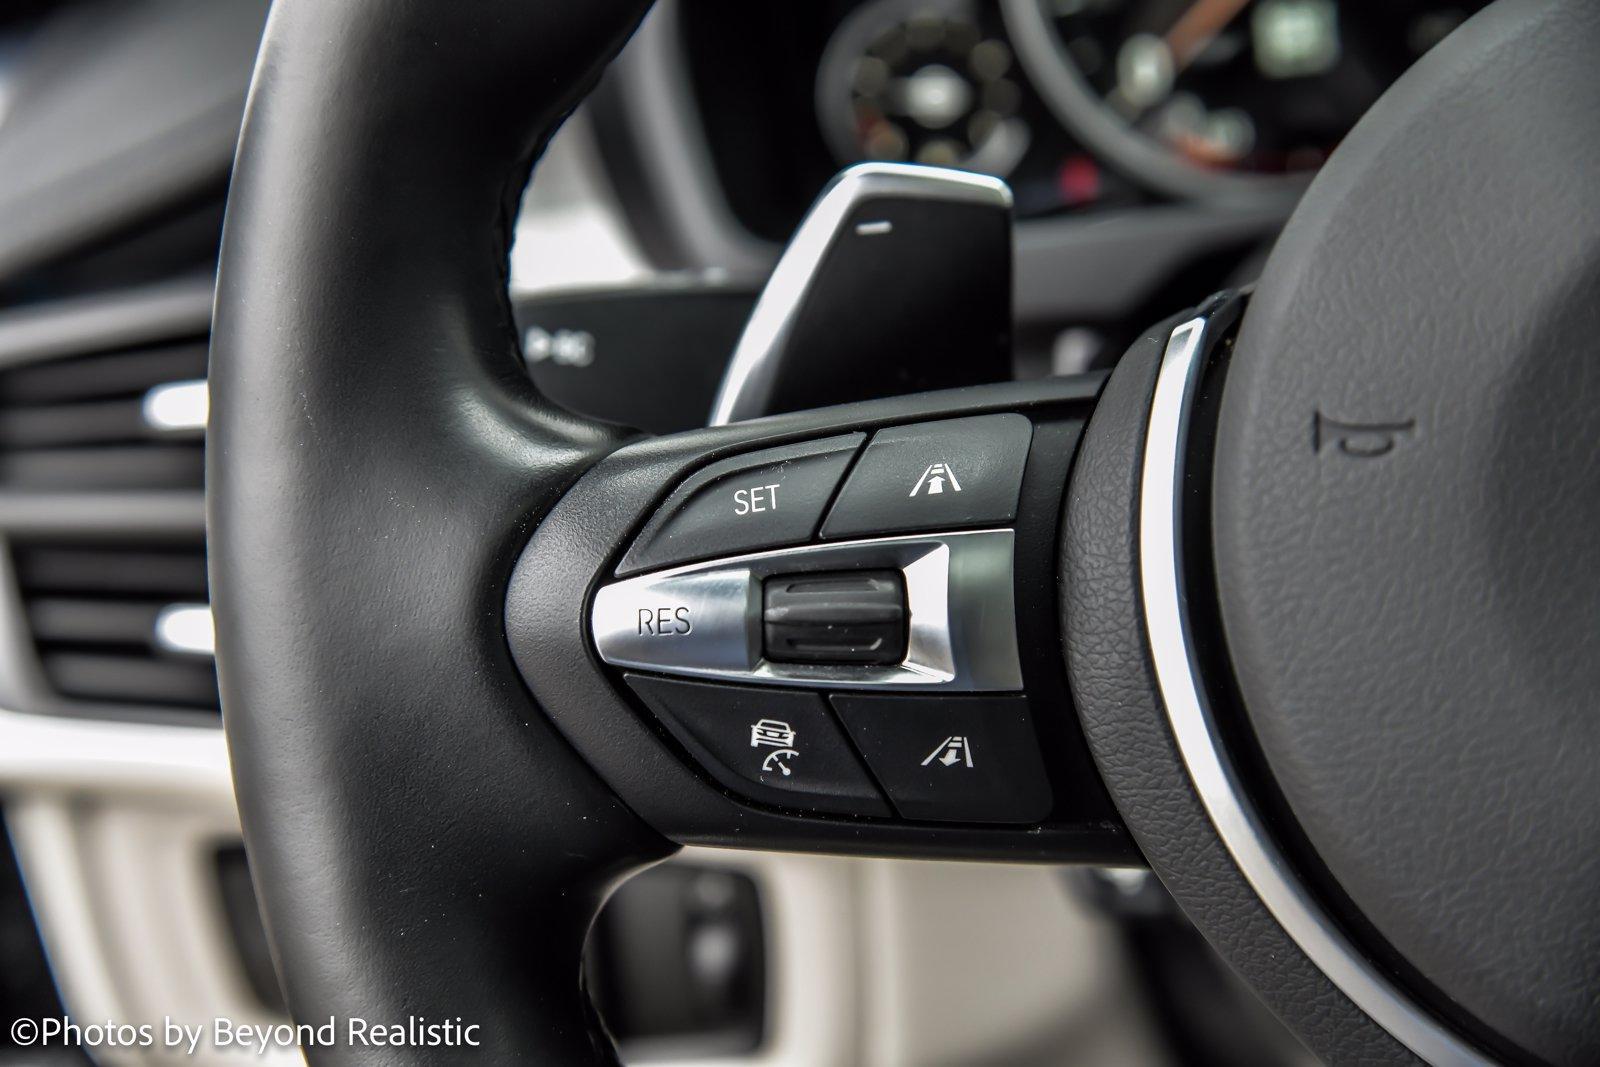 Used 2018 BMW X6 xDrive35i M-Sport Executive | Downers Grove, IL